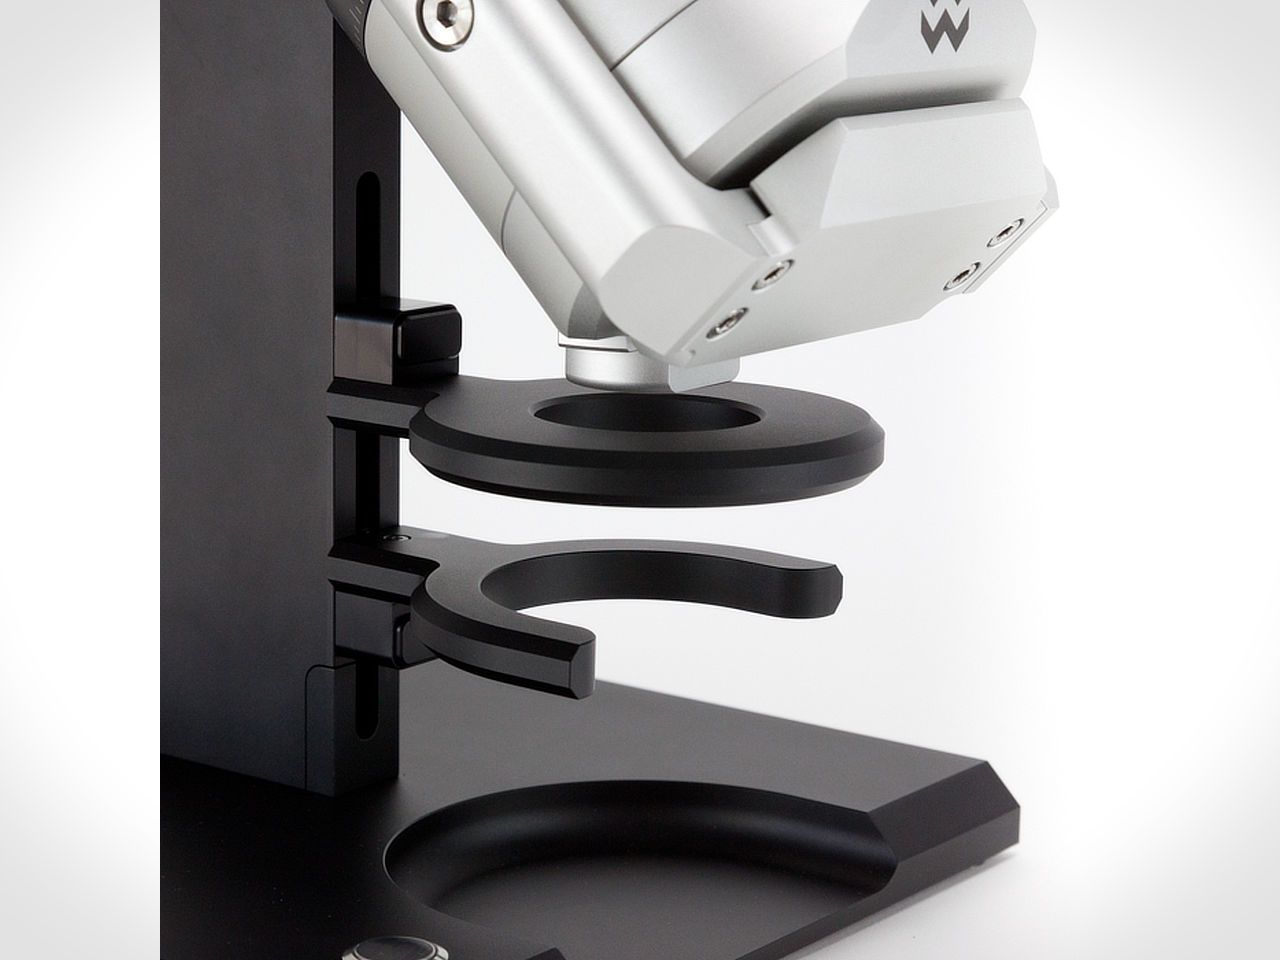 lyn-weber-eg1-coffee-grinder-004